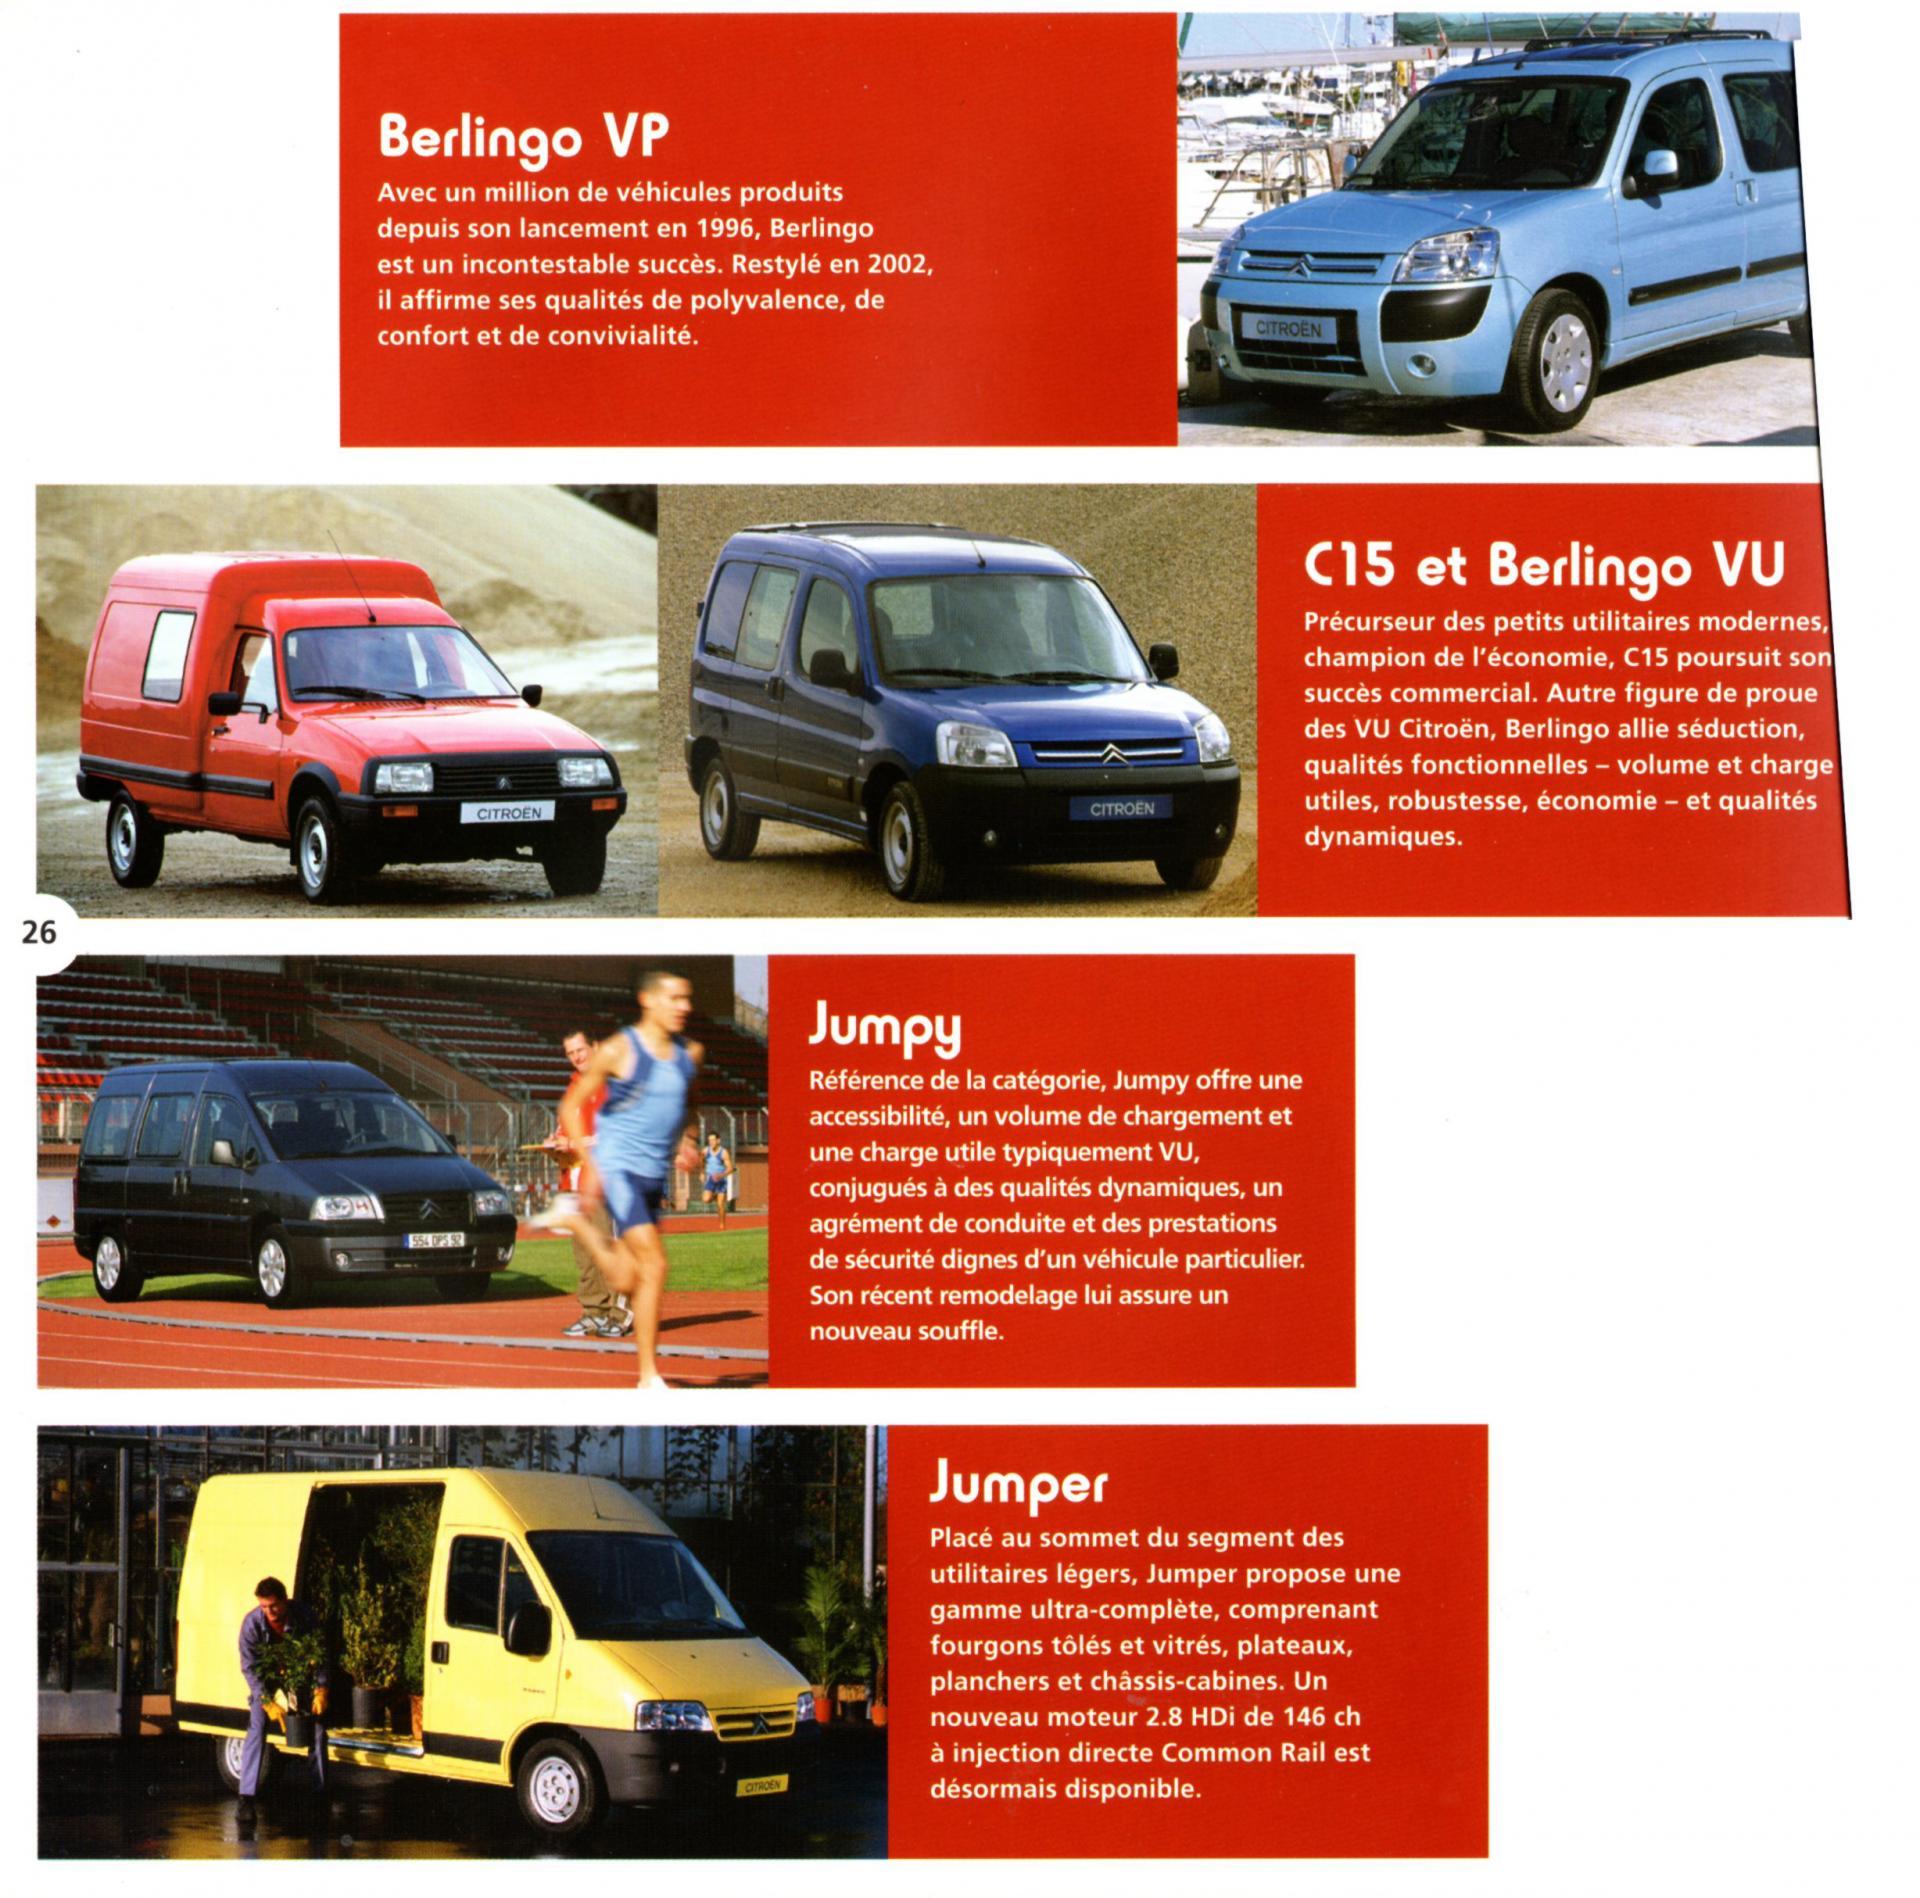 Image gamme Citroën 2004 2005